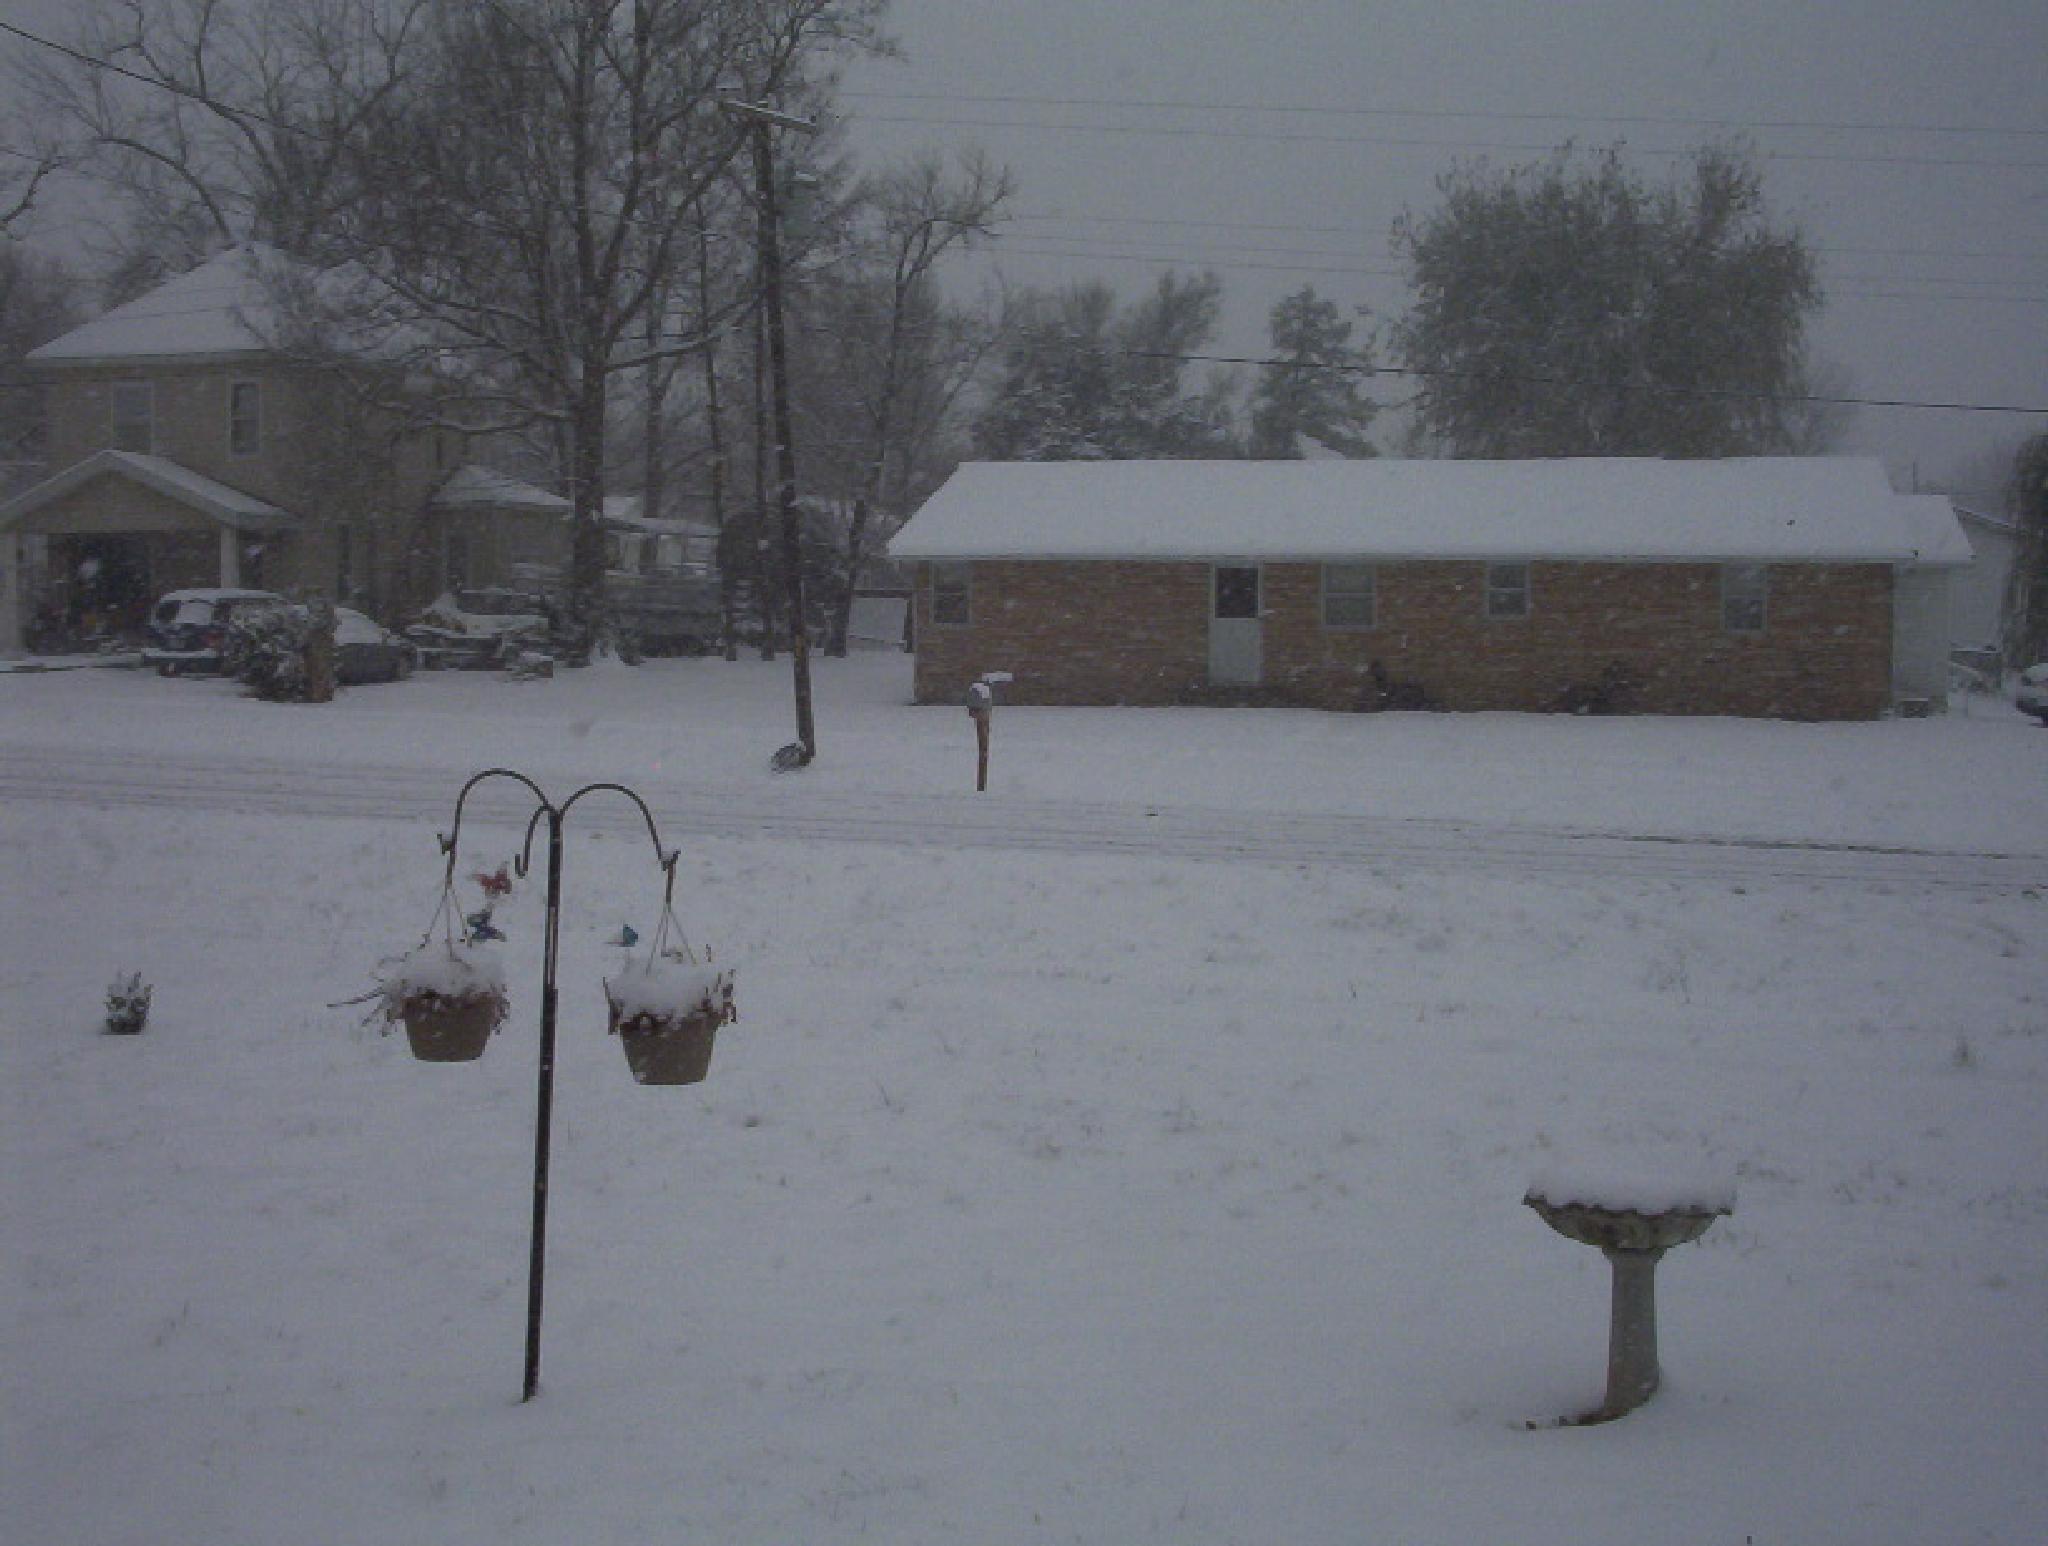 SPRING SNOW by peggy.klimadunkinbenning